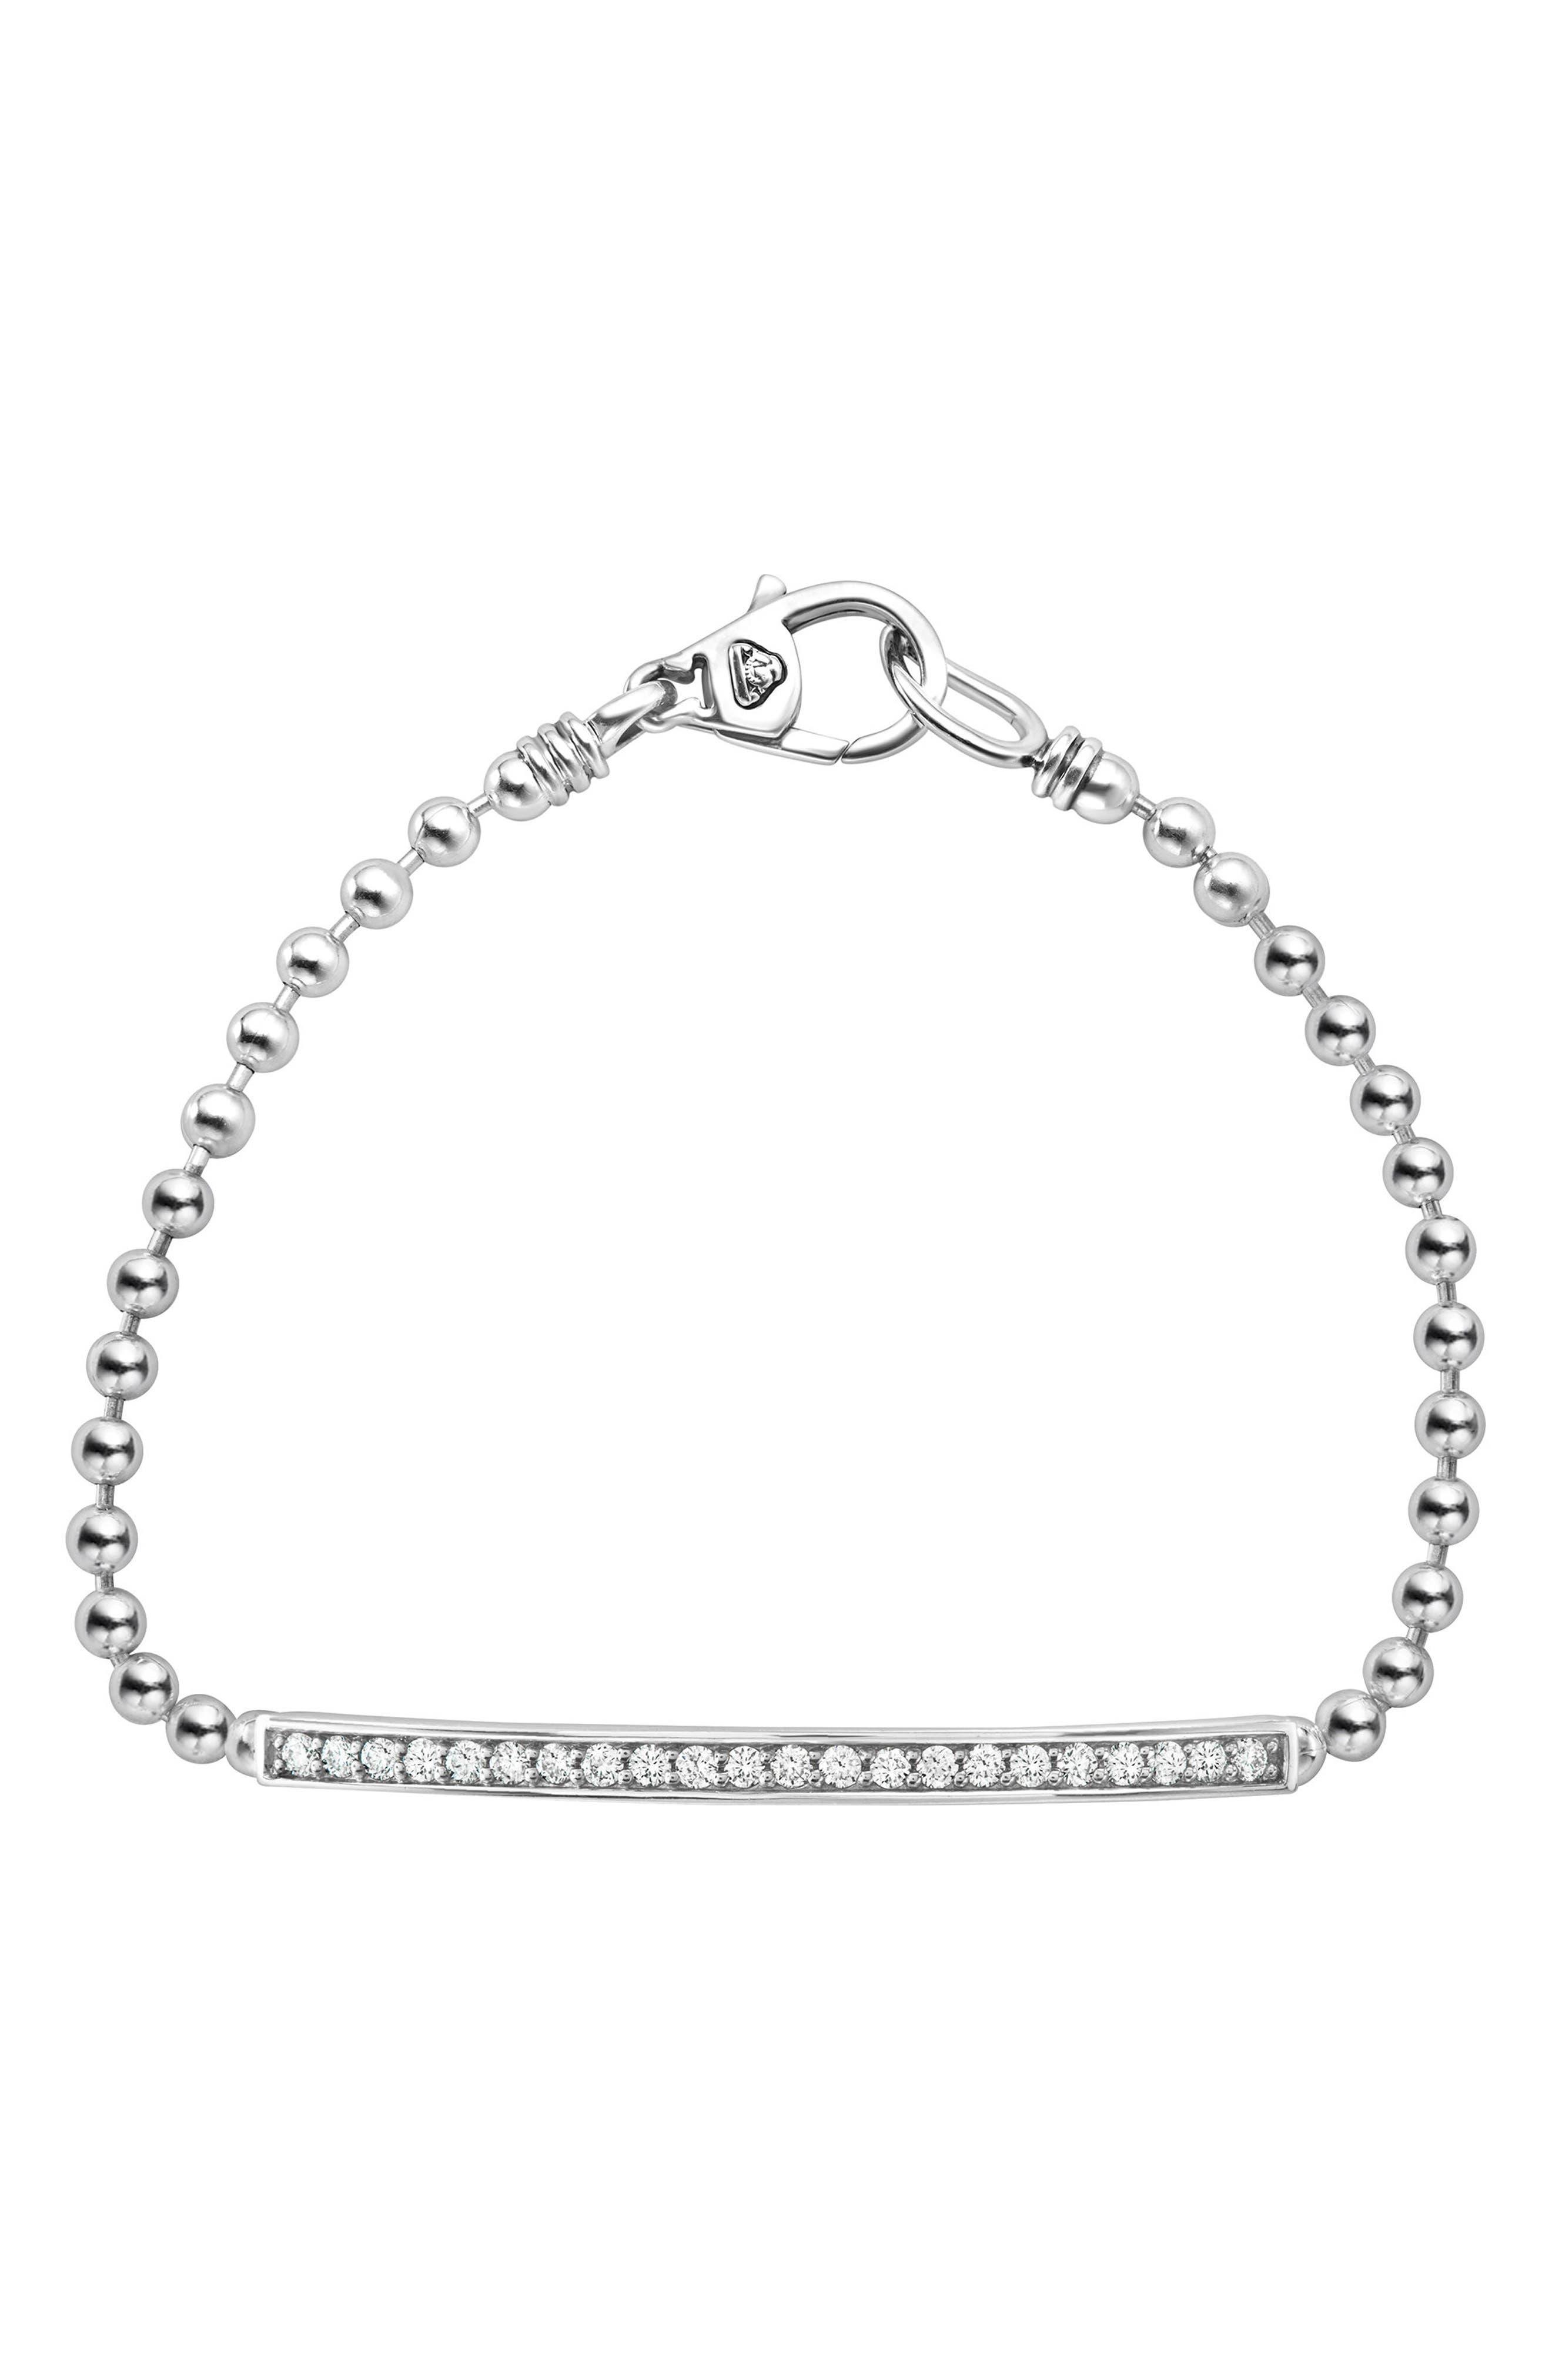 Caviar Spark Diamond Bracelet,                             Main thumbnail 1, color,                             Silver/ Diamond